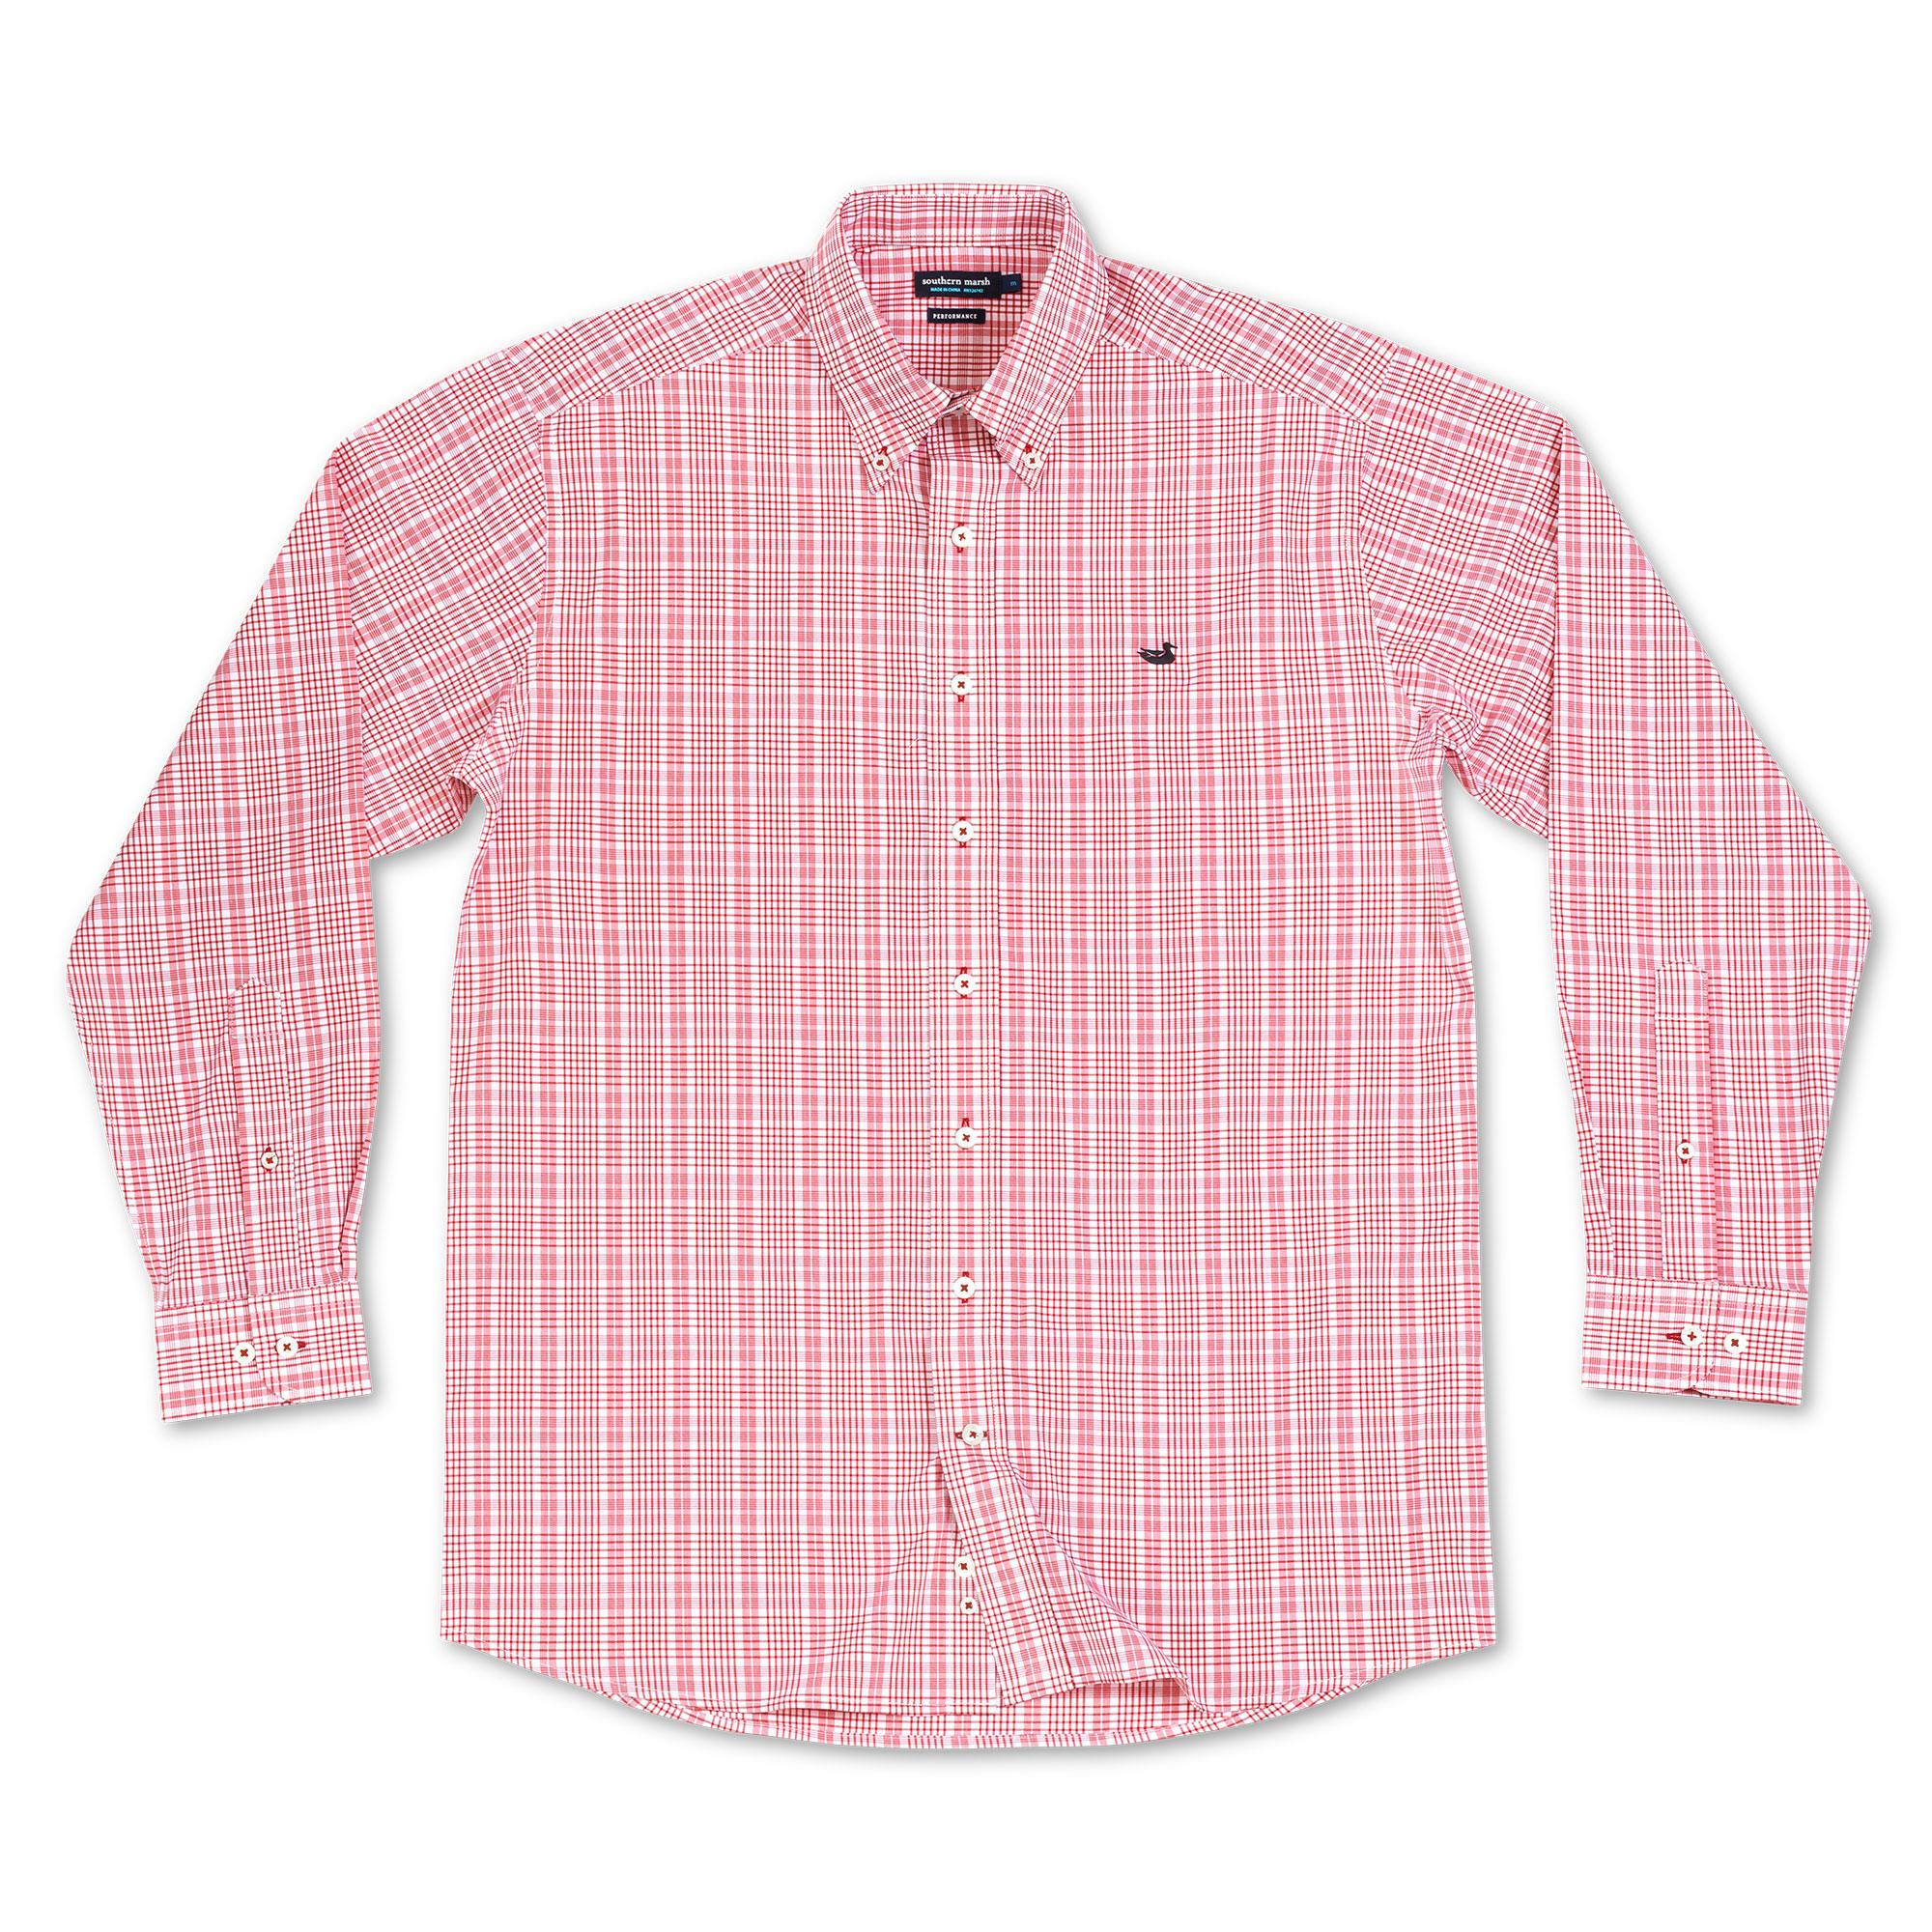 Southern Marsh Shenandoah Performance Check Dress Shirt